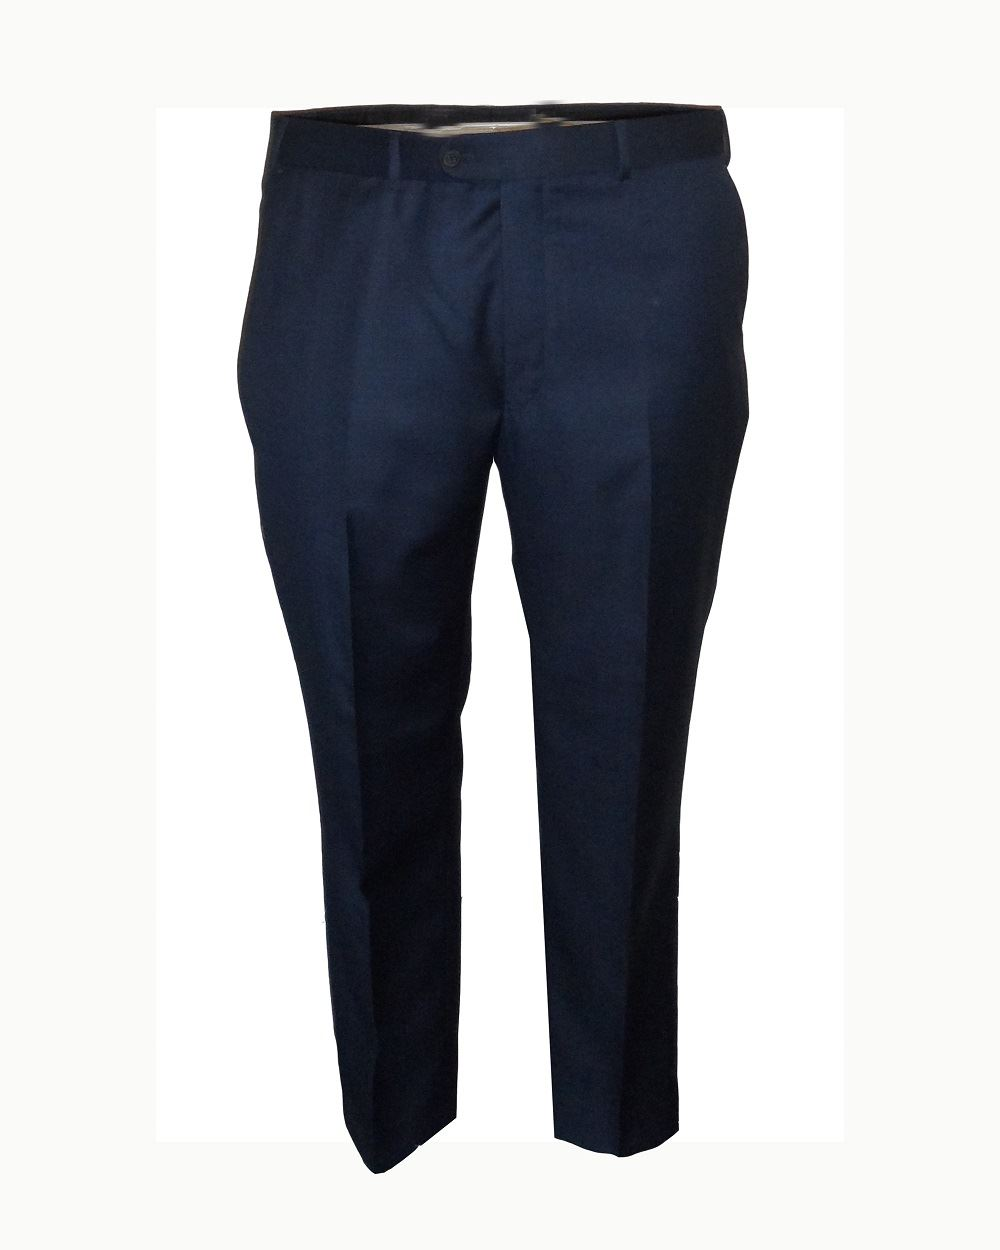 vita Troursers lana Troursers scozzese Ink In uomo Scott waist Blue Front piatto In Blend Scott 28 58 58 misto Abito 28 Blue Suit Wool Flat Mens Ink da w0Iq10P